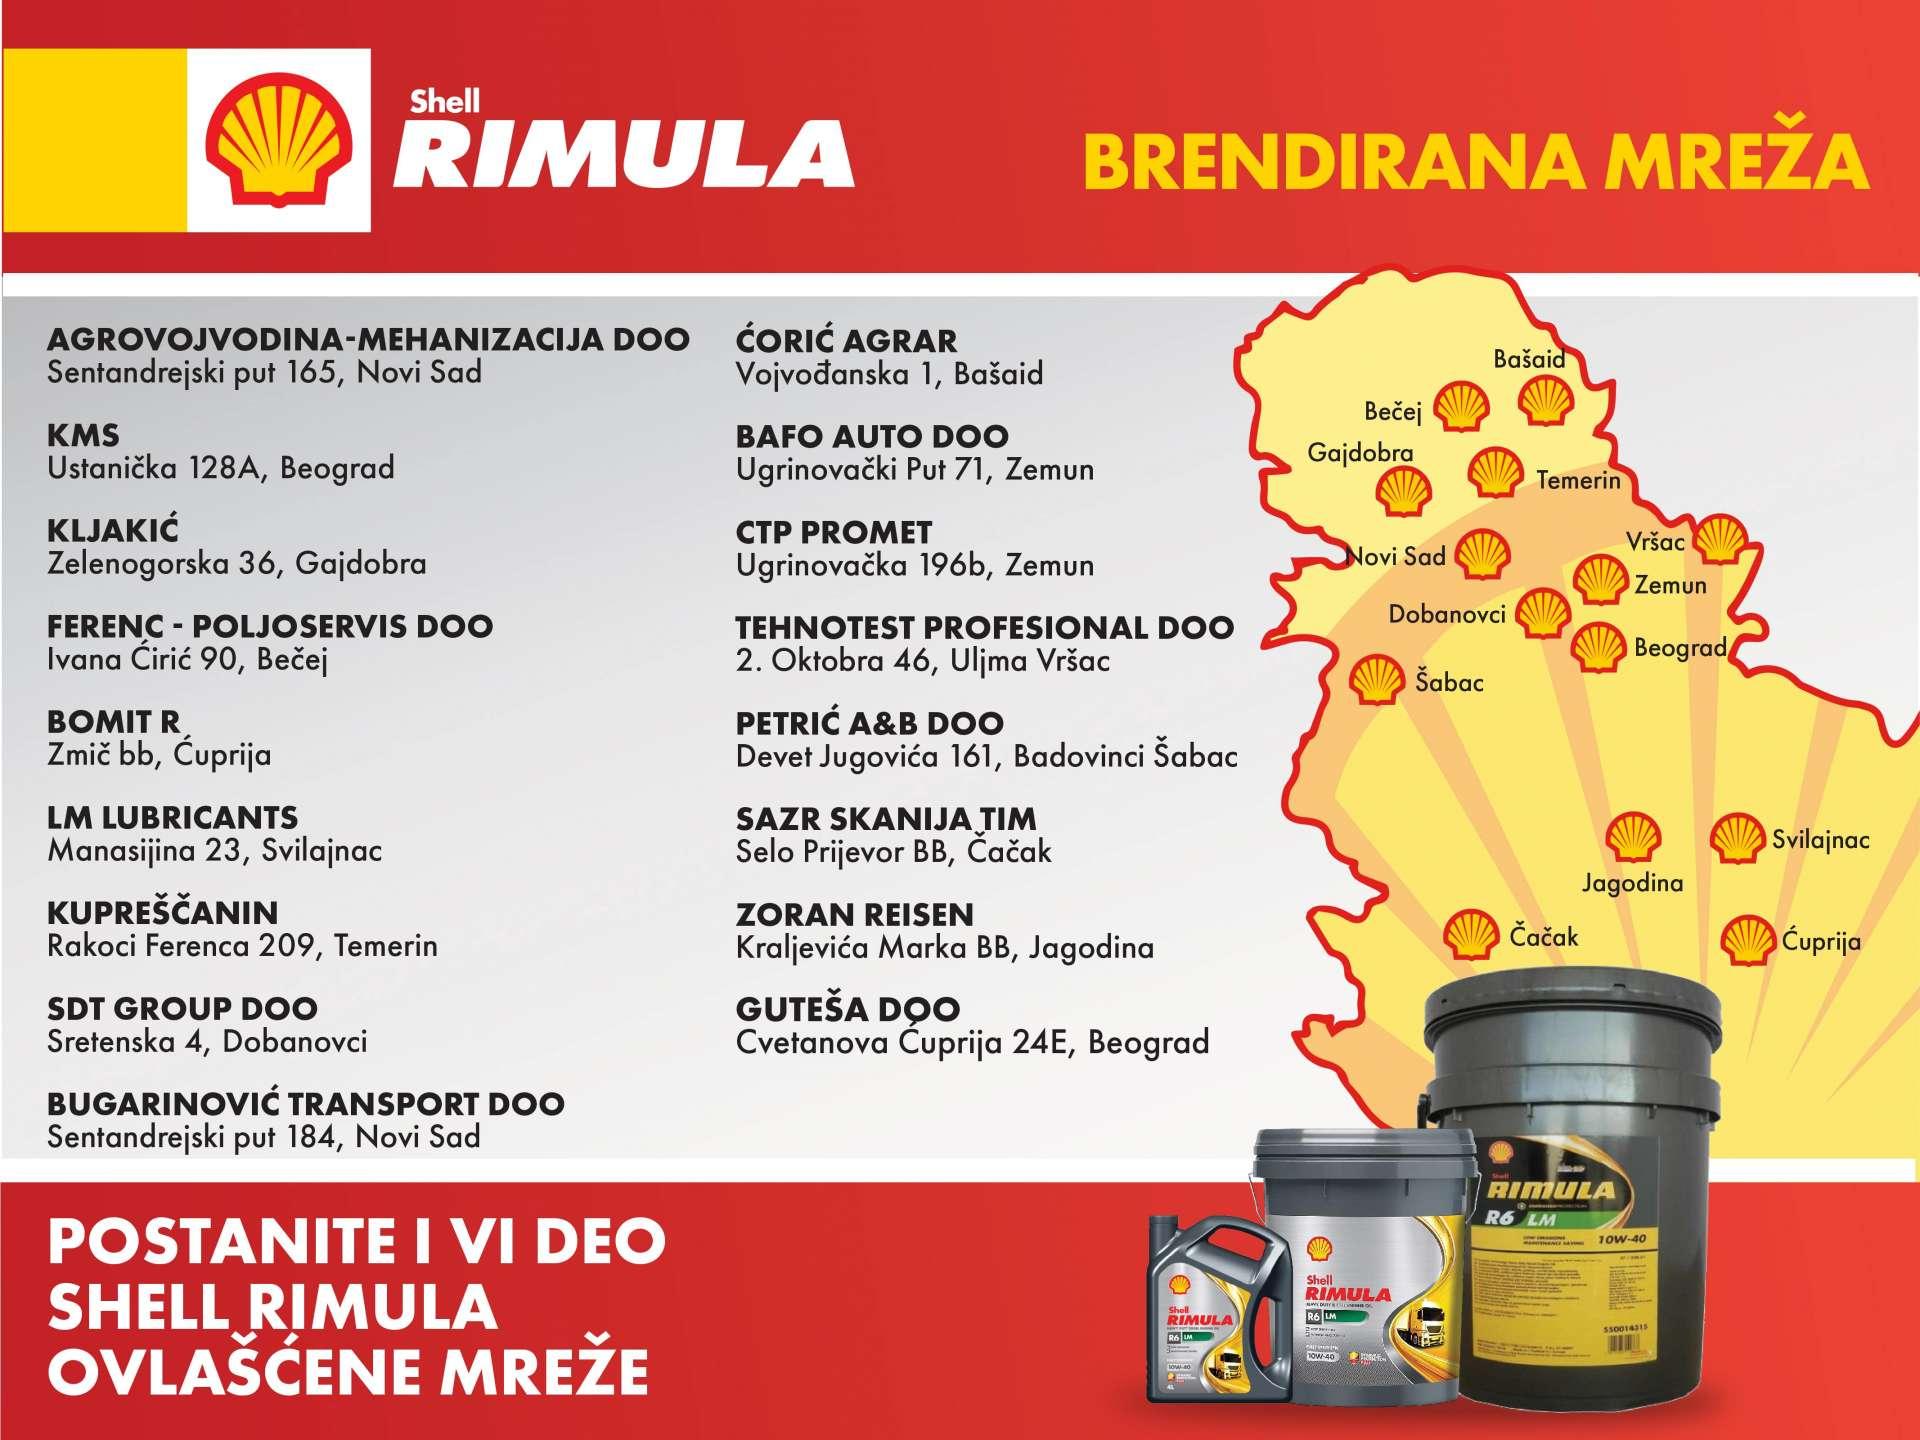 Shell RIMULA Brendirana mreža